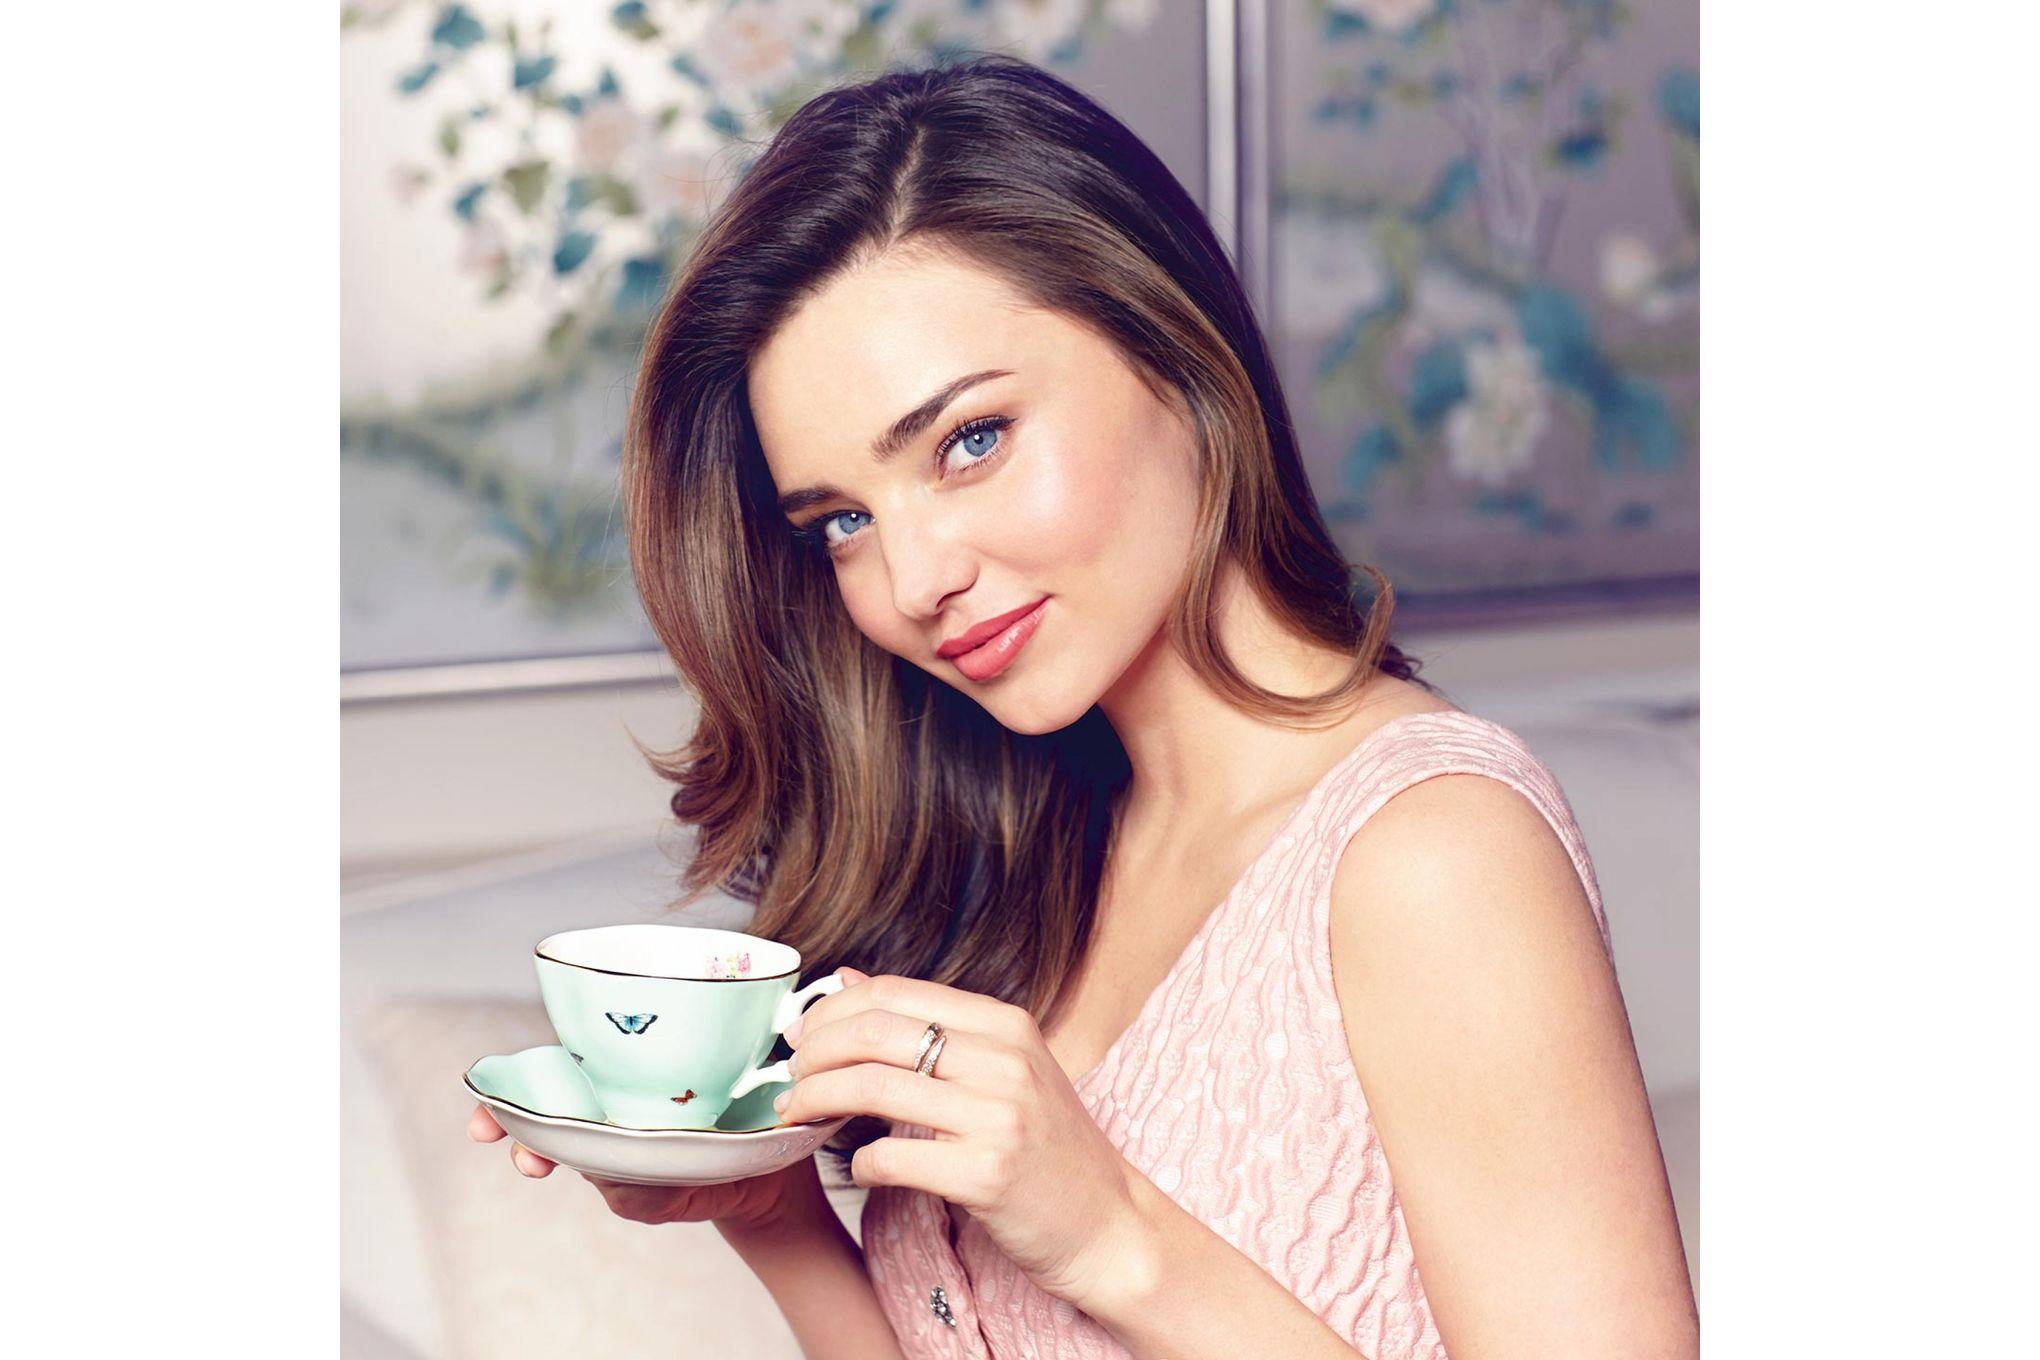 Miranda Kerr for Royal Albert Blessings 3 Piece Set Teacup, Saucer, Plate 20cm Blessings thumb 4